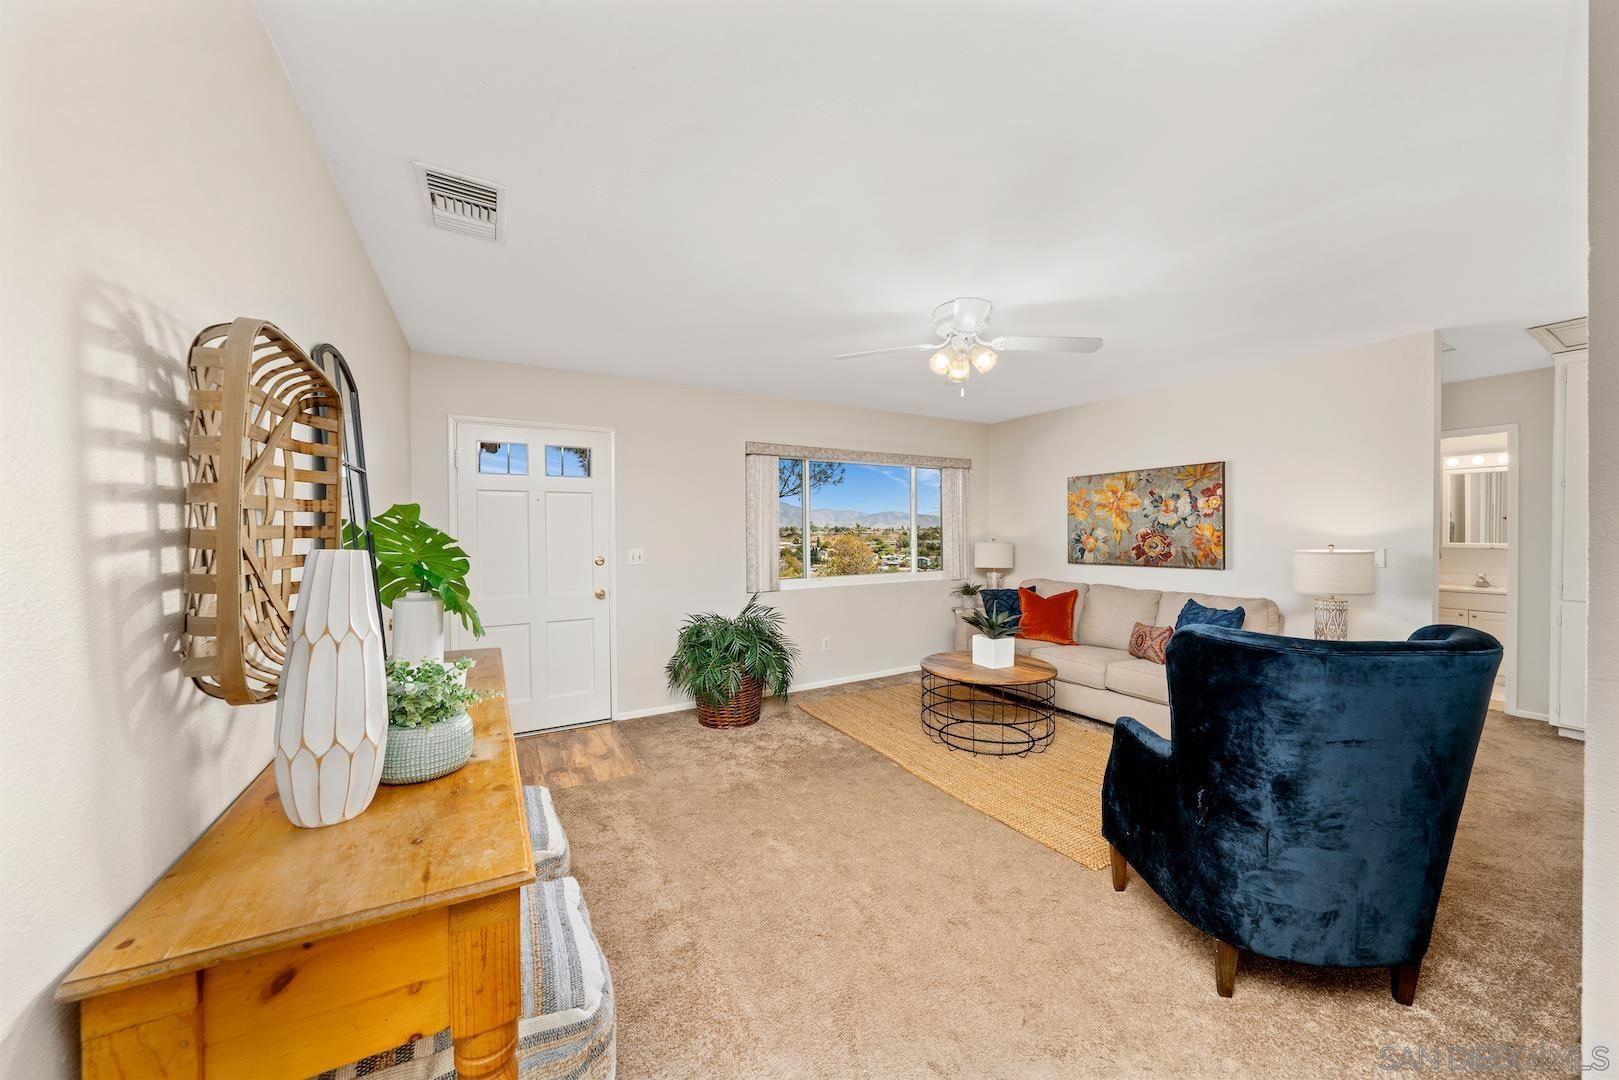 Photo of 1798 69th St, Lemon Grove, CA 91945 (MLS # 210028298)